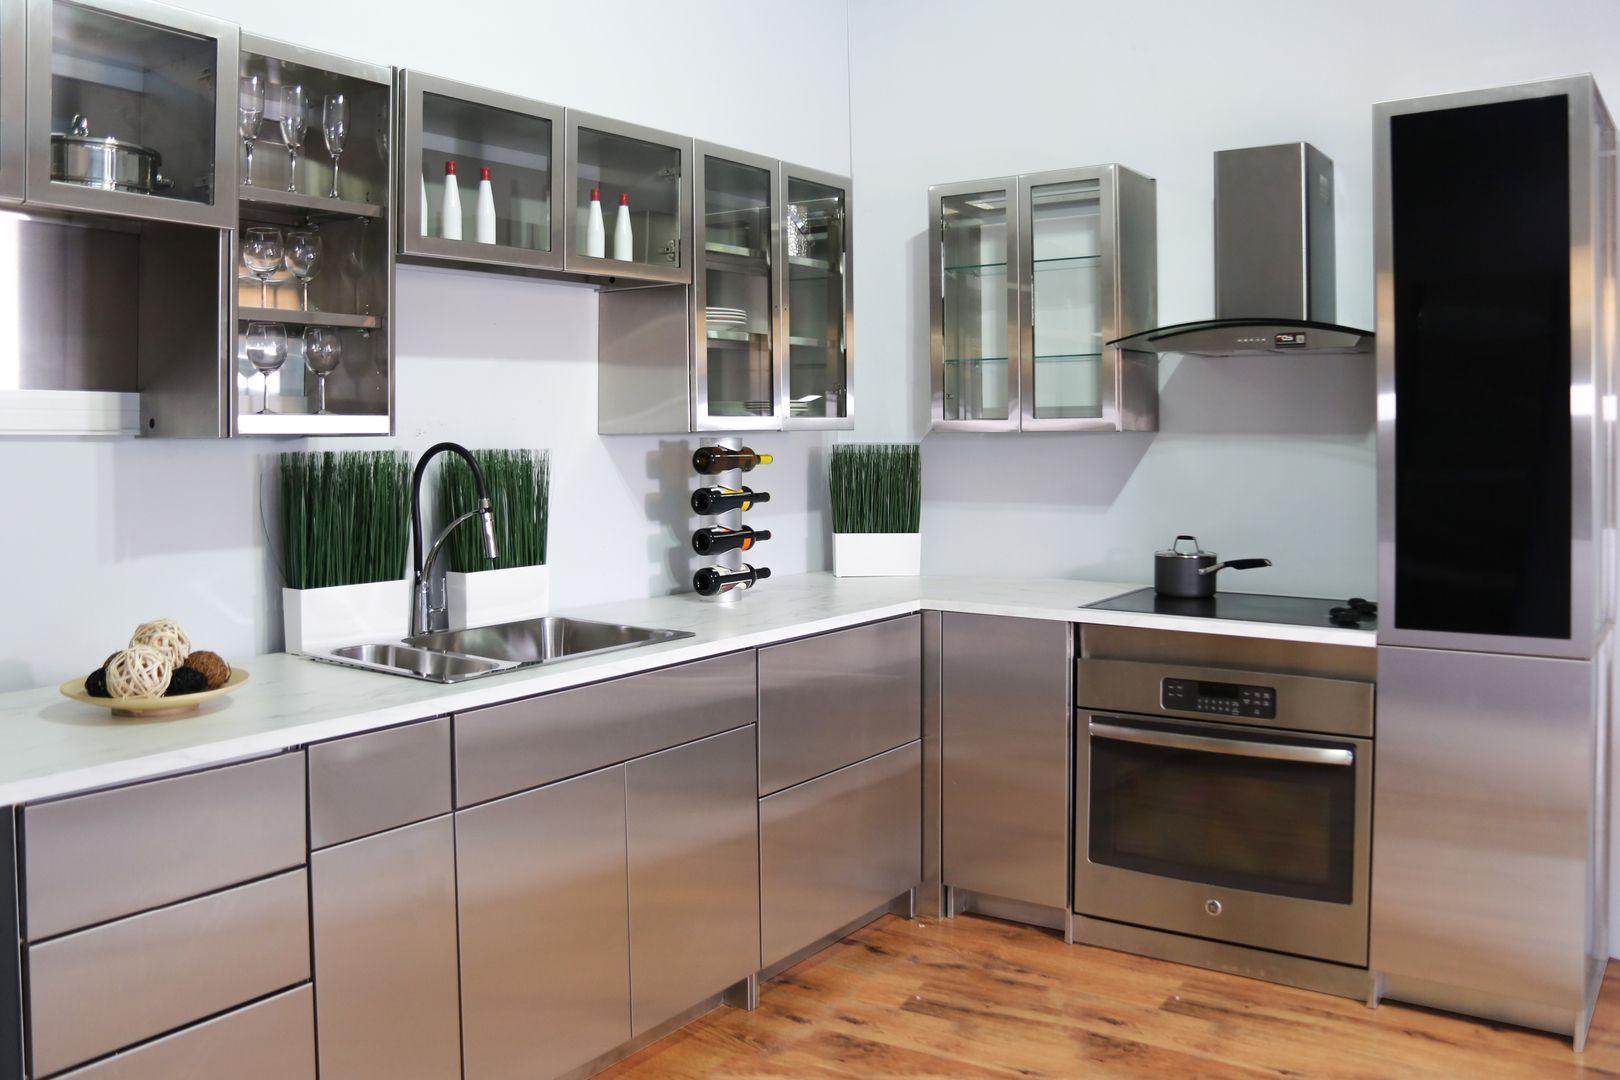 Stainless Steel Kitchen Cabinets Aluminum Kitchen Cabinets Stainless Steel Kitchen Cabinets Steel Kitchen Cabinets